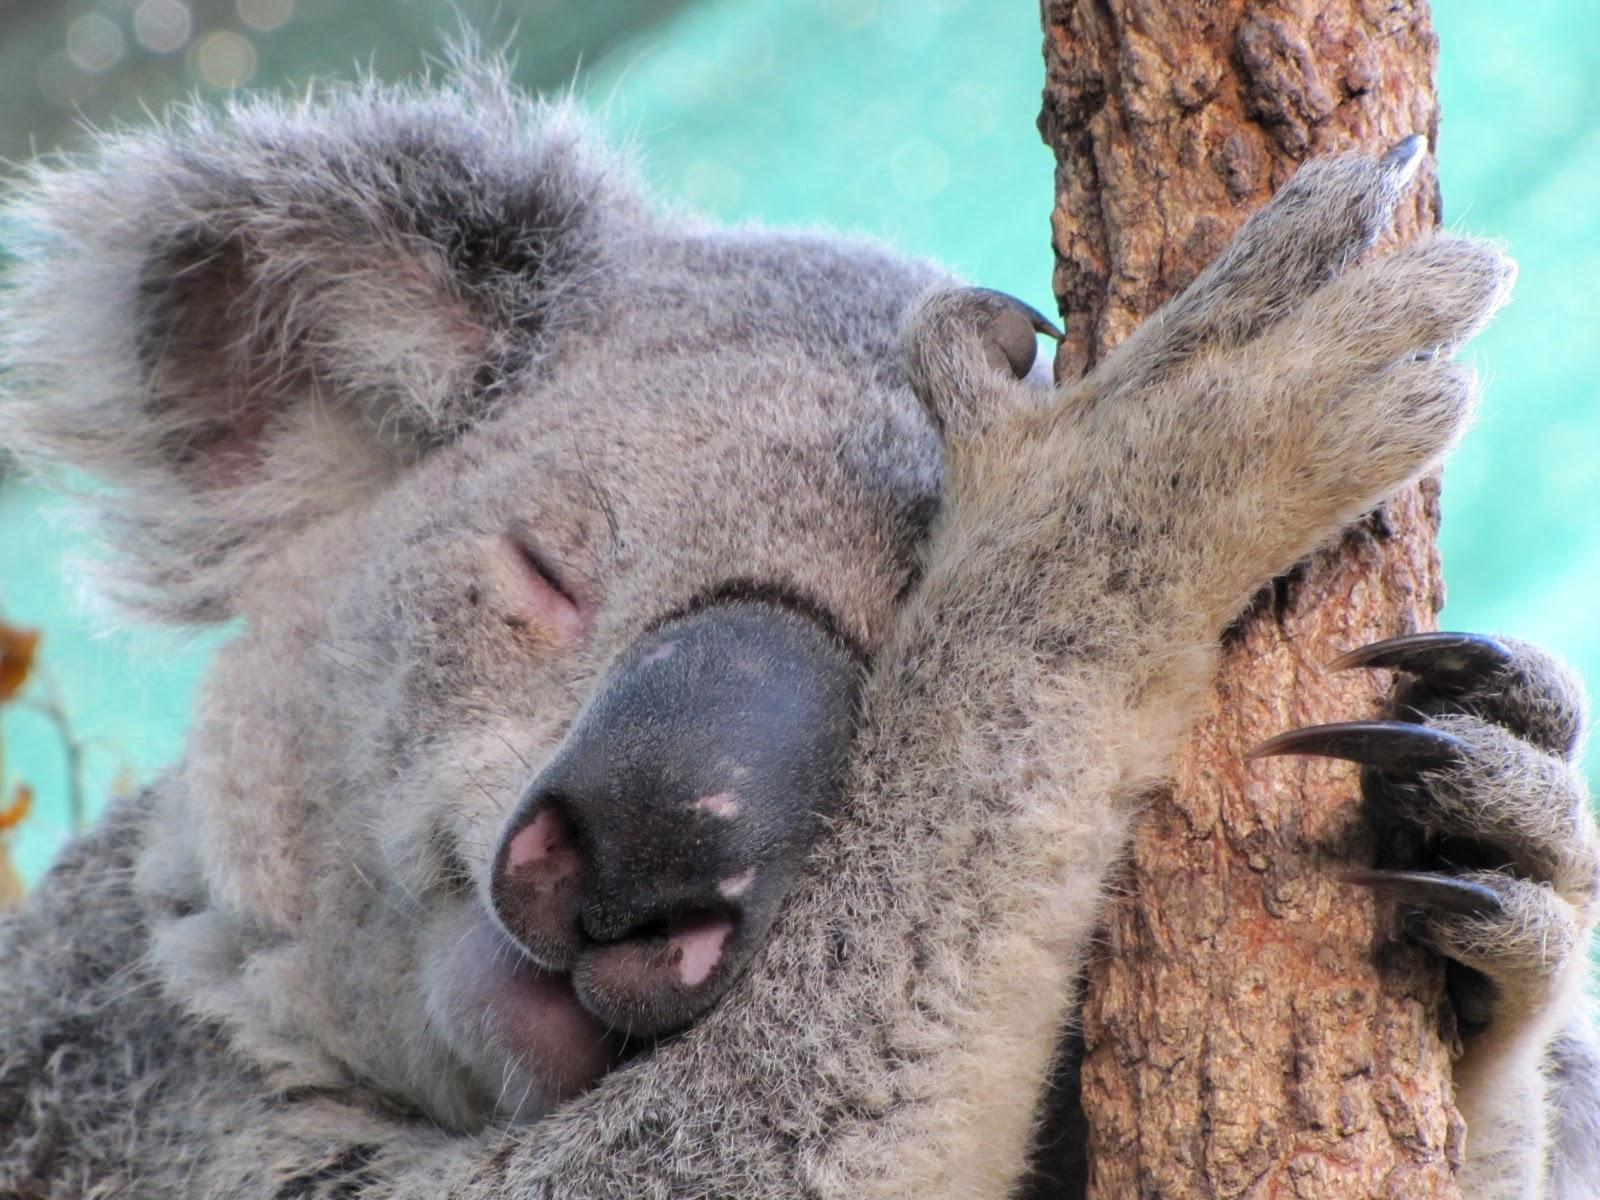 smiling koala picture - HD1600×1200